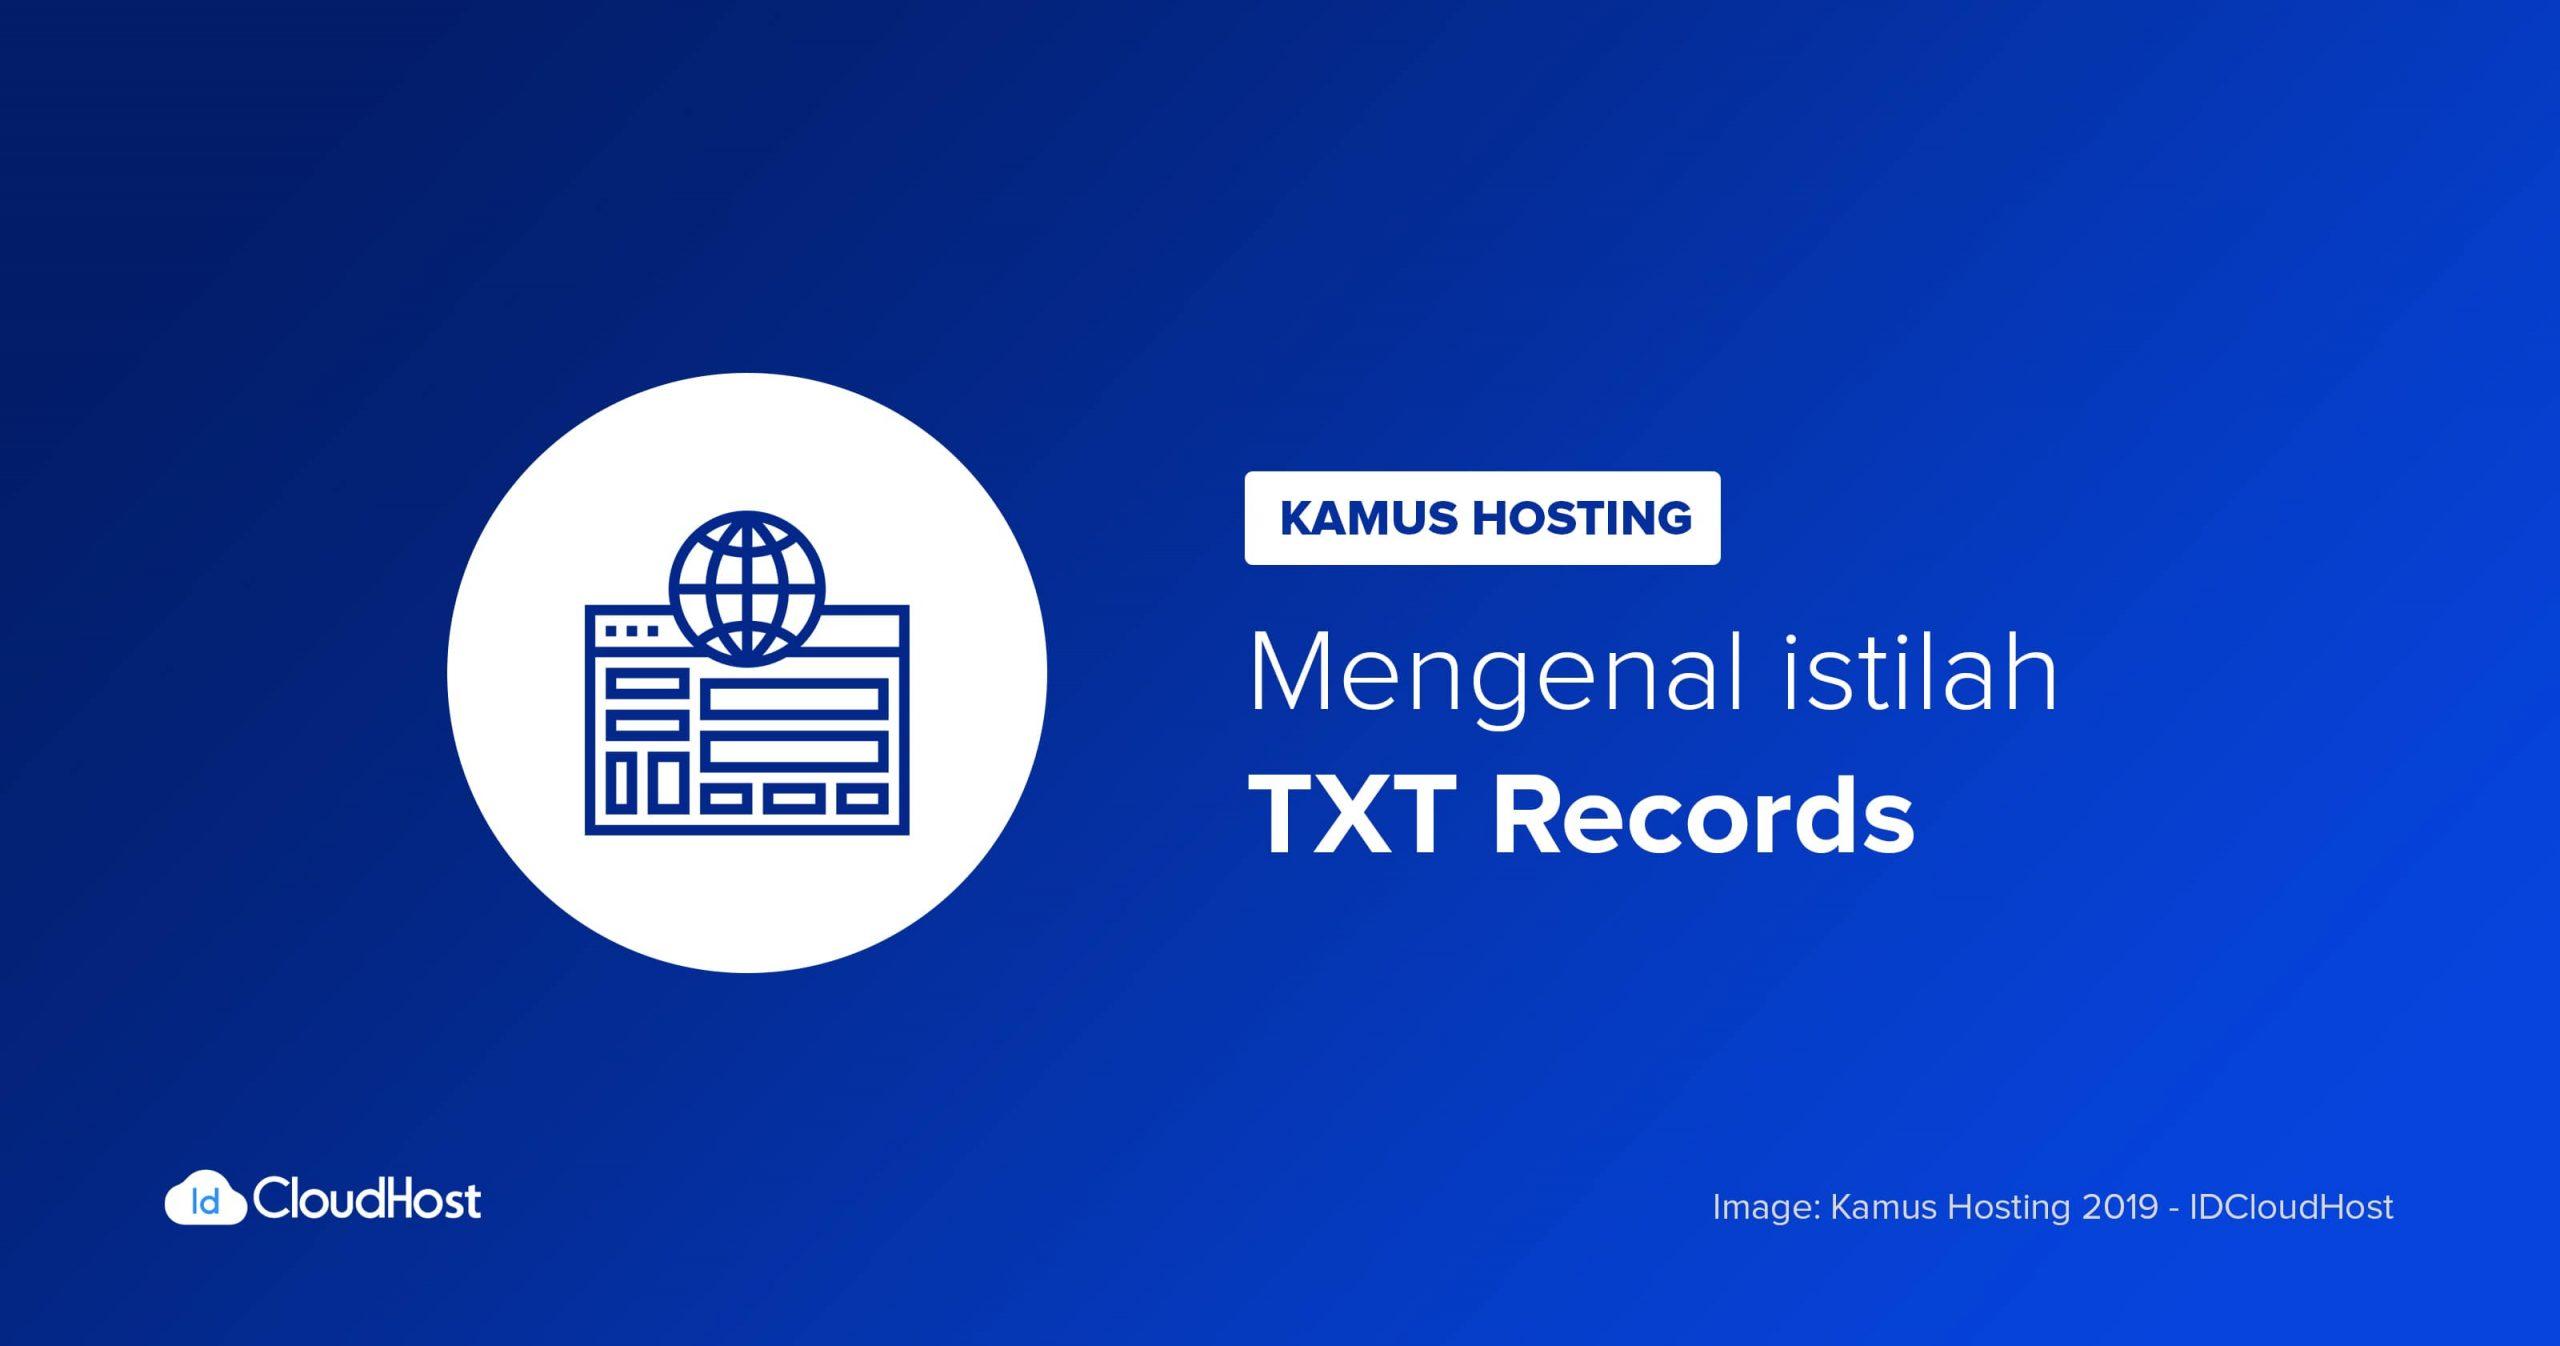 TXT Records